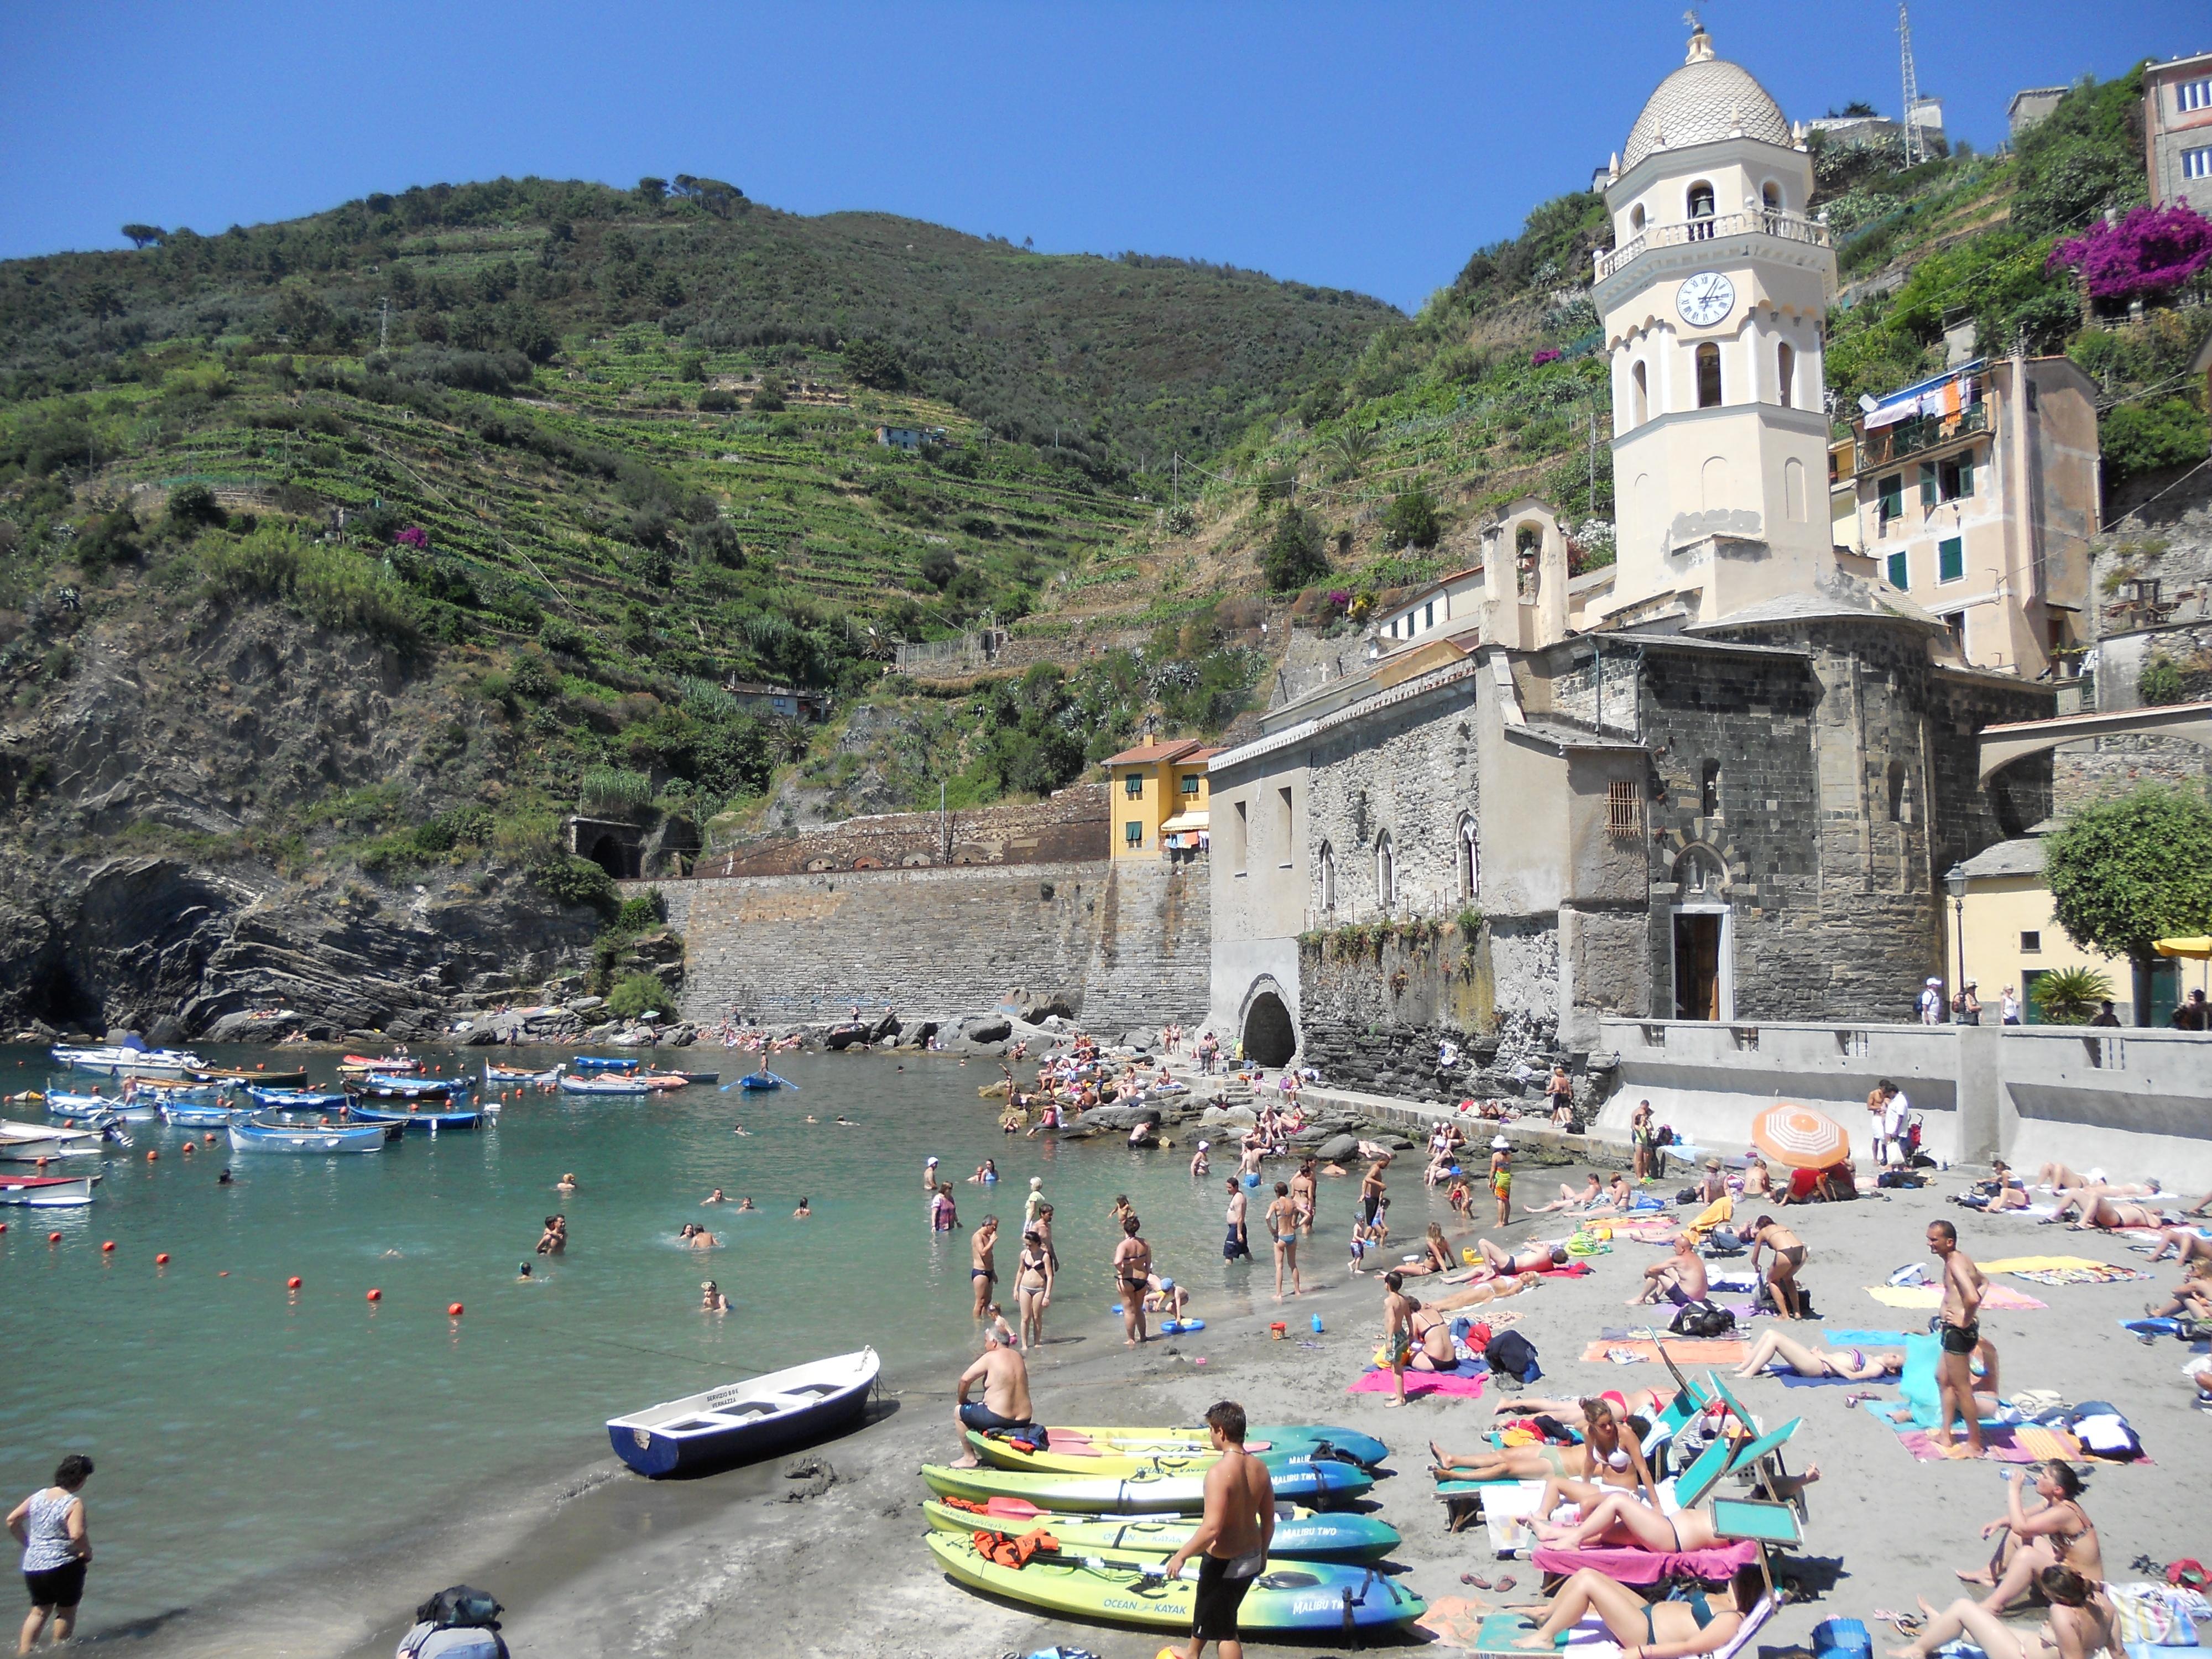 Beach in Vernazza, Cinque Terre, Italy | Tami Clayton Benedict Cumberbatch Facebook